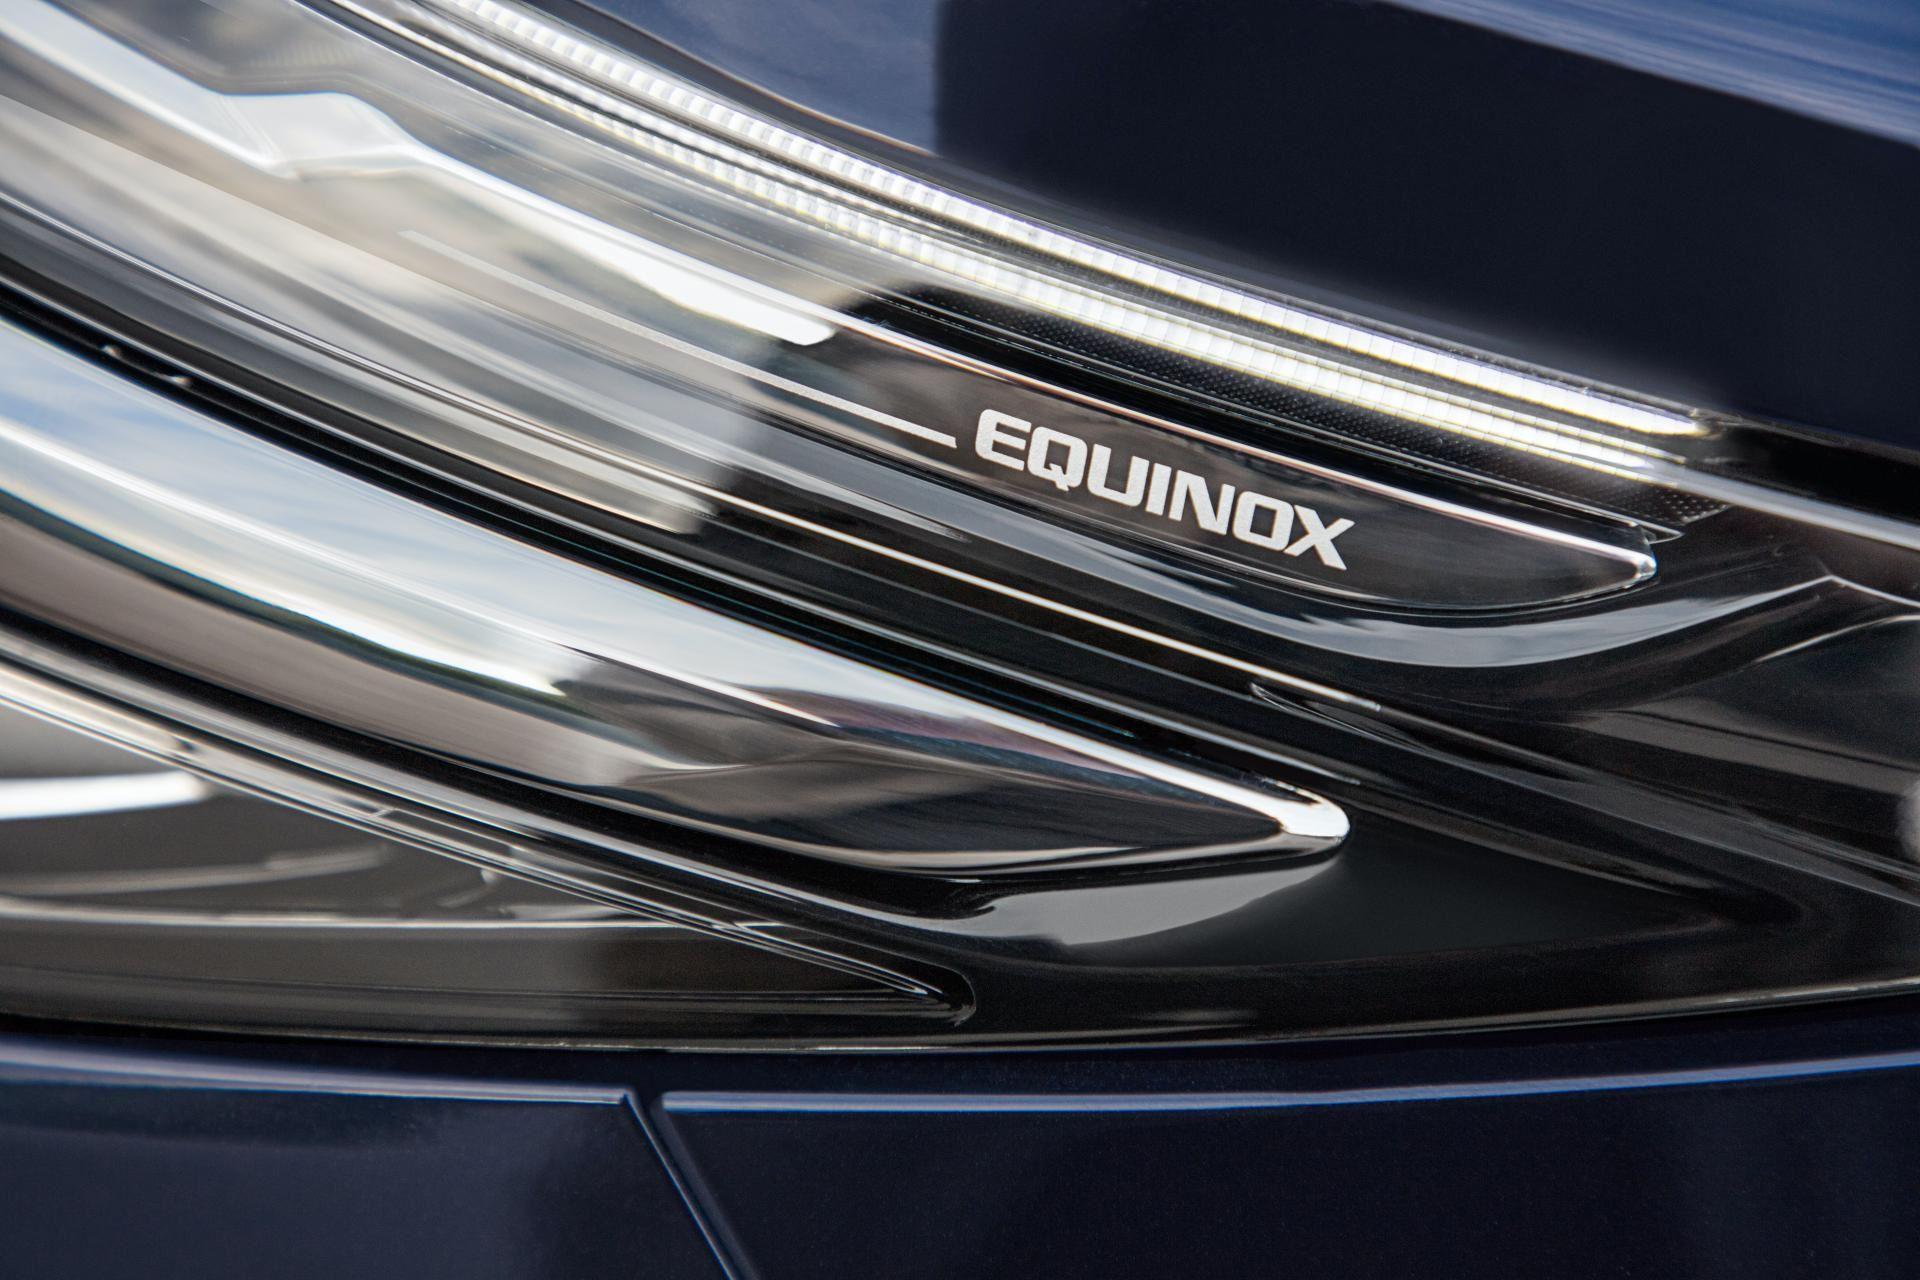 Chevrolet-Equinox-facelift-2020-19